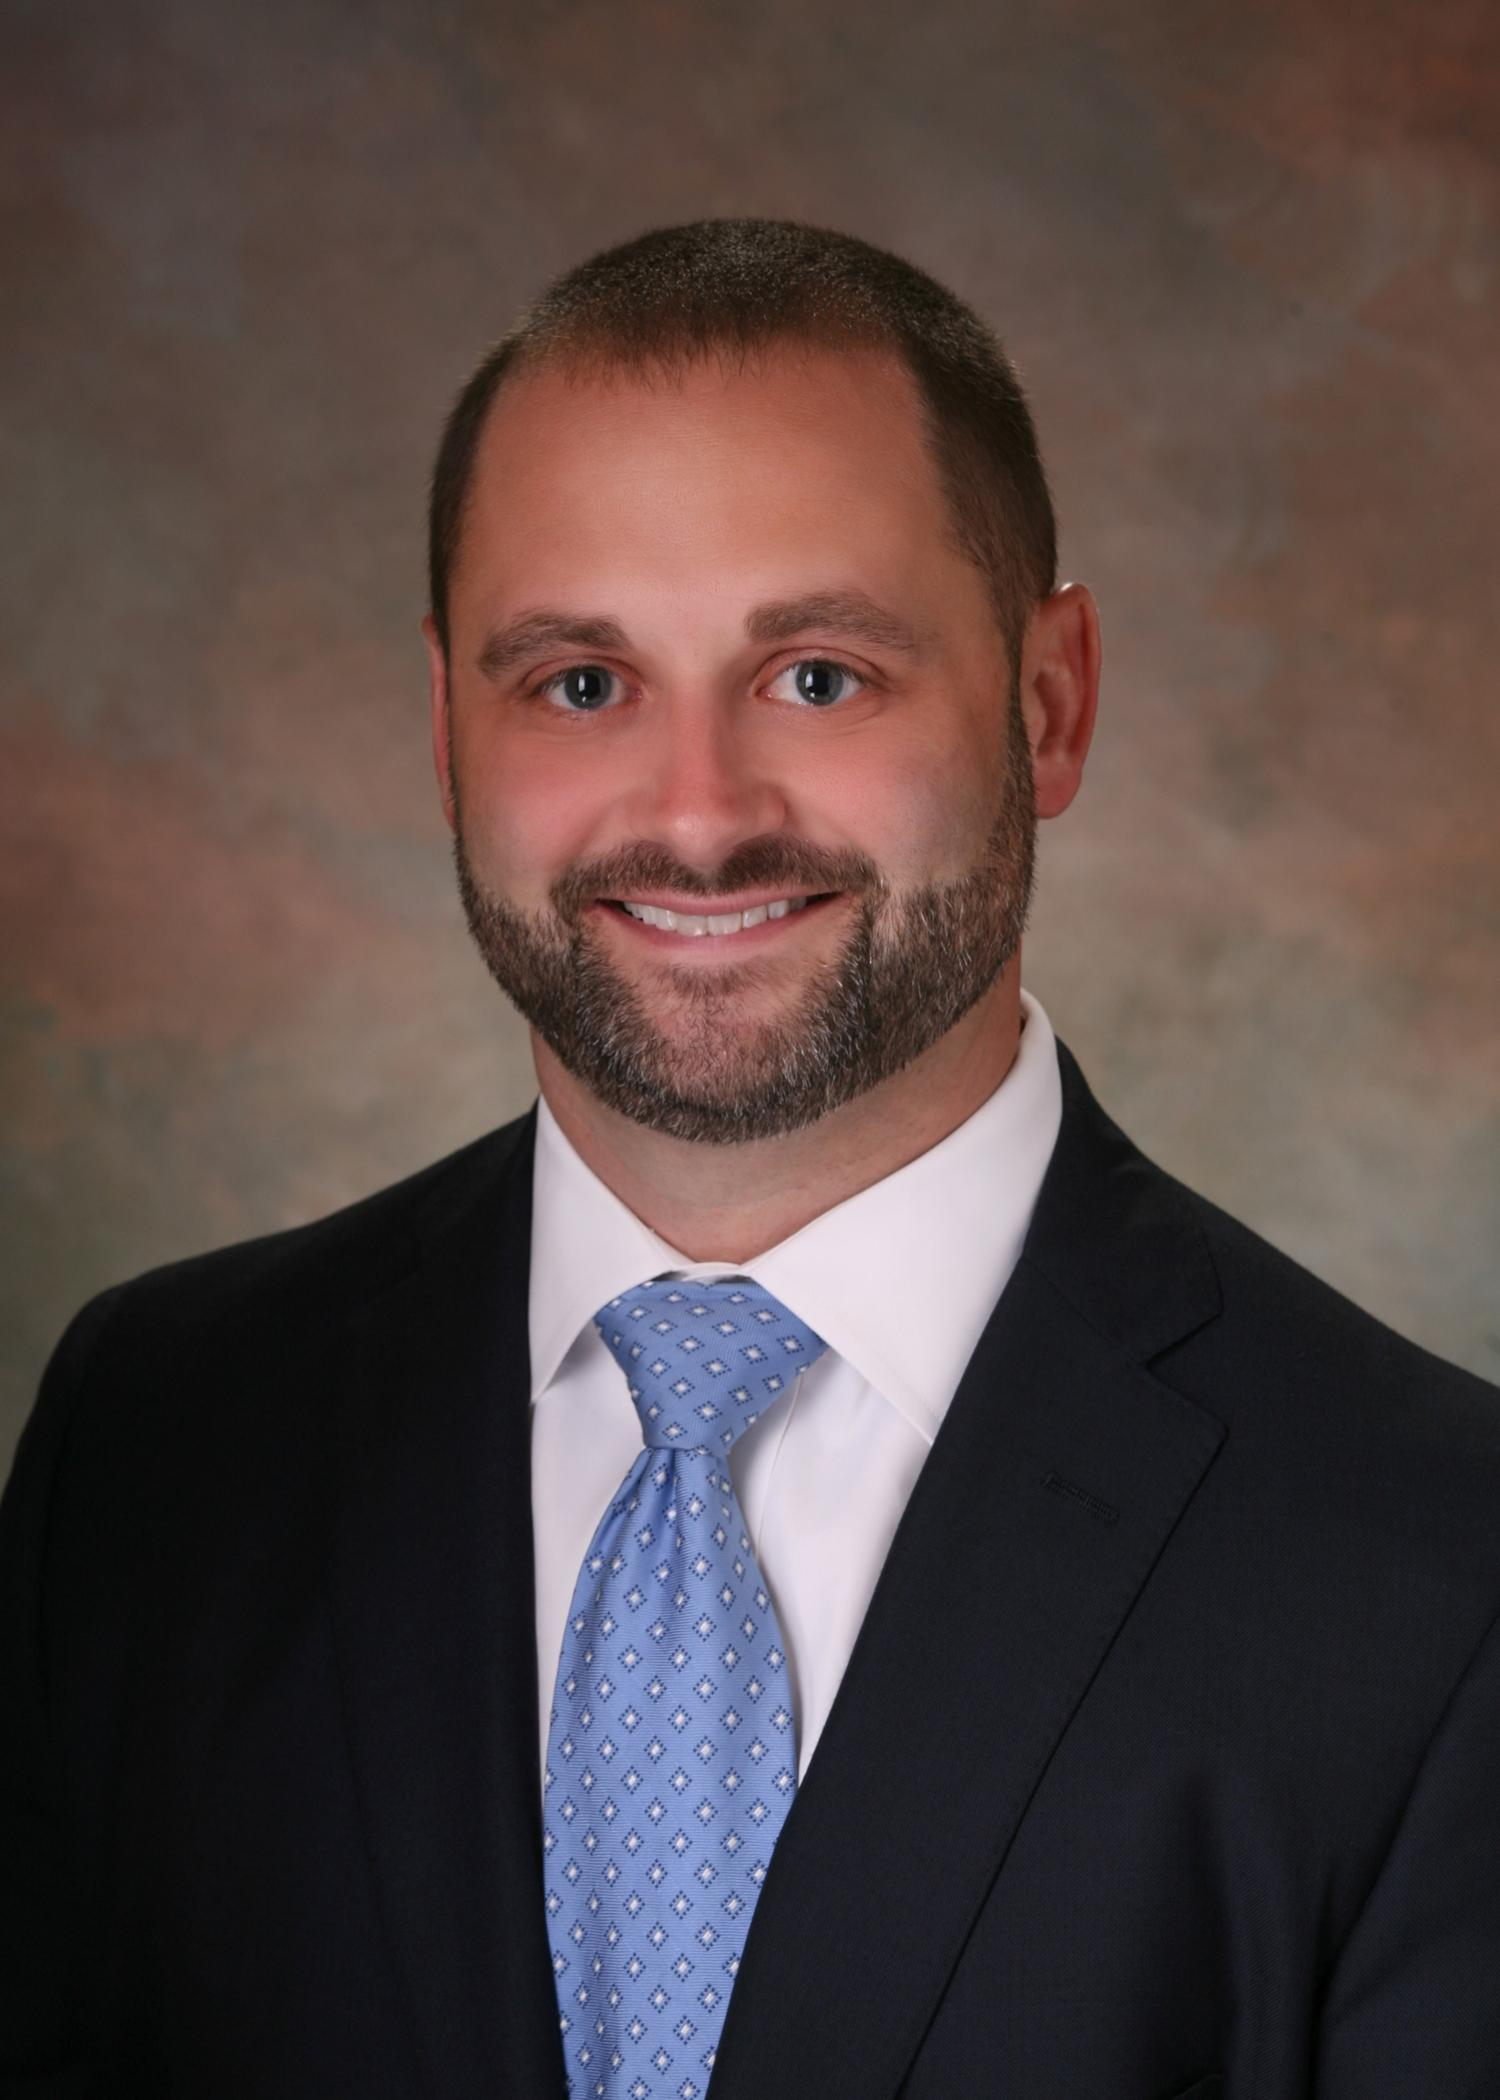 GREGORY S. SHELTON Financial Advisor